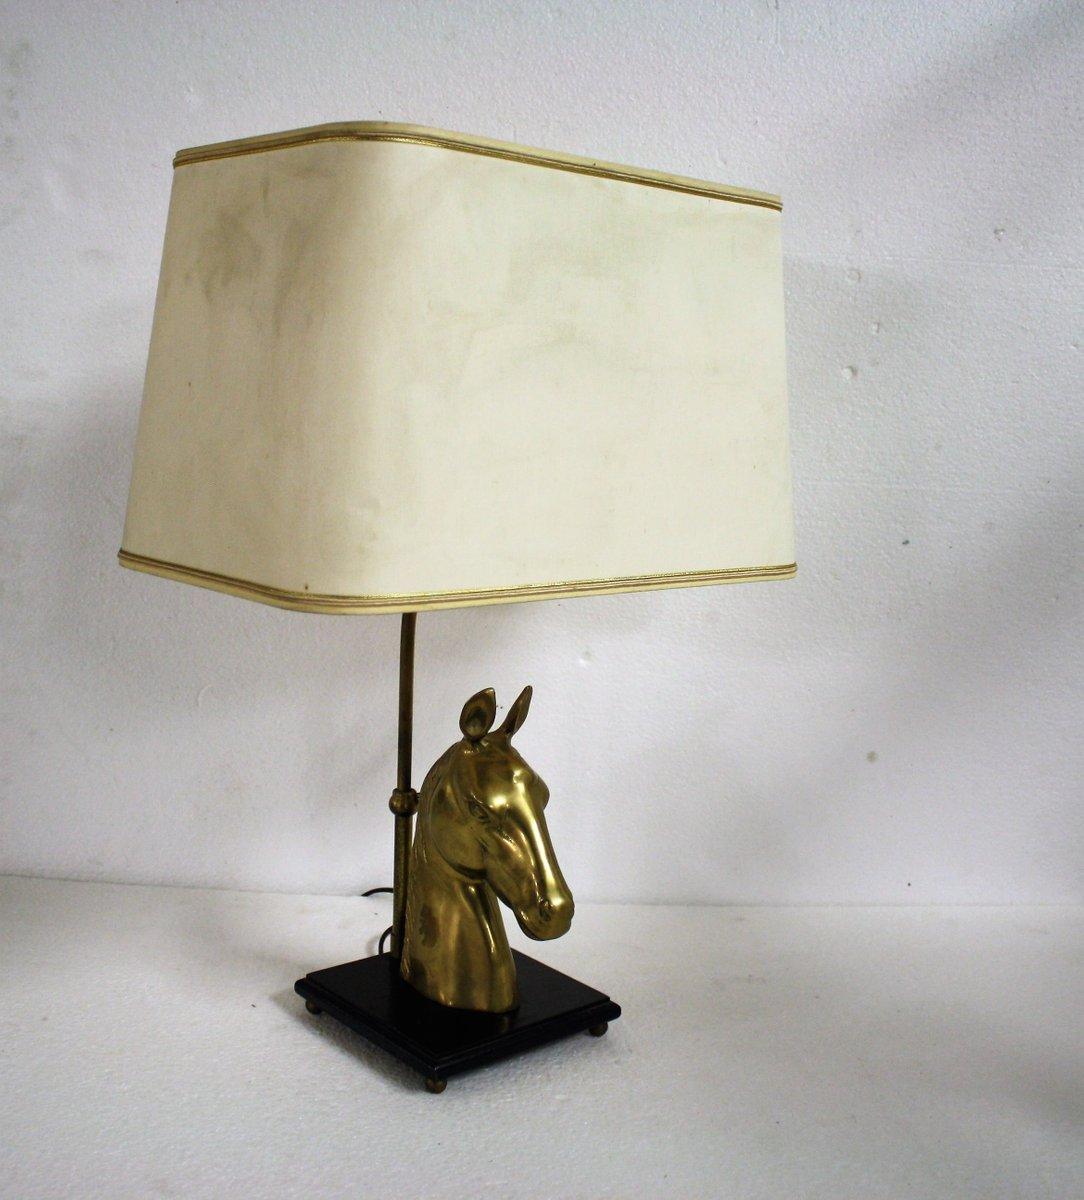 Pferdekopf Tischlampe aus Messing, 1970er